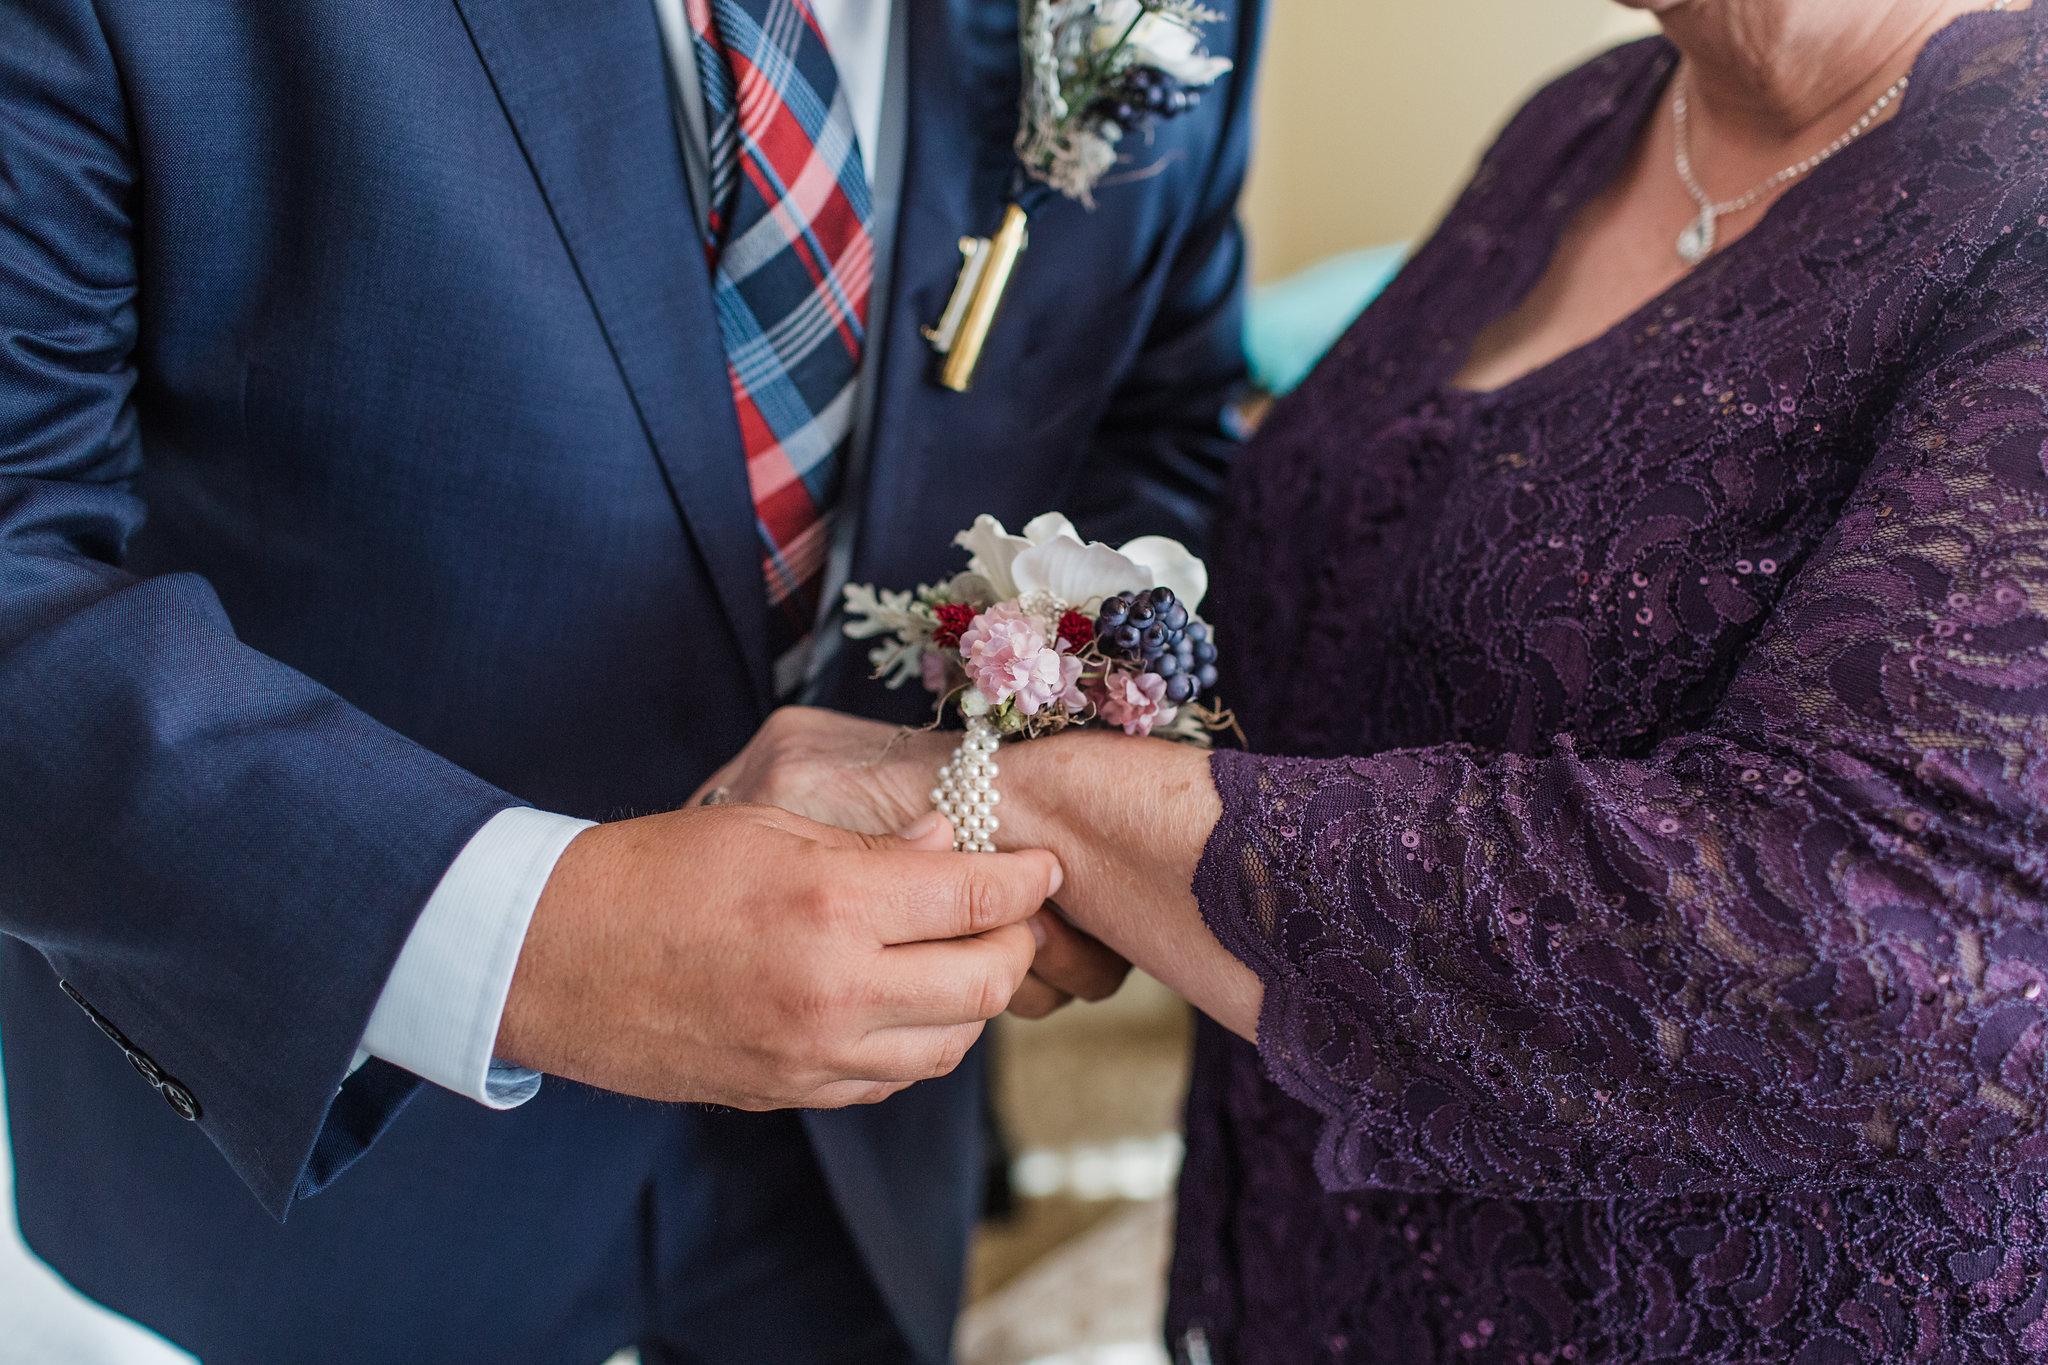 apt-b-photography-kristy-rob-wormsloe-elopment-savannah-wedding-photographer-savannah-elopement-wormsloe-wedding-historic-savannah-6.jpg